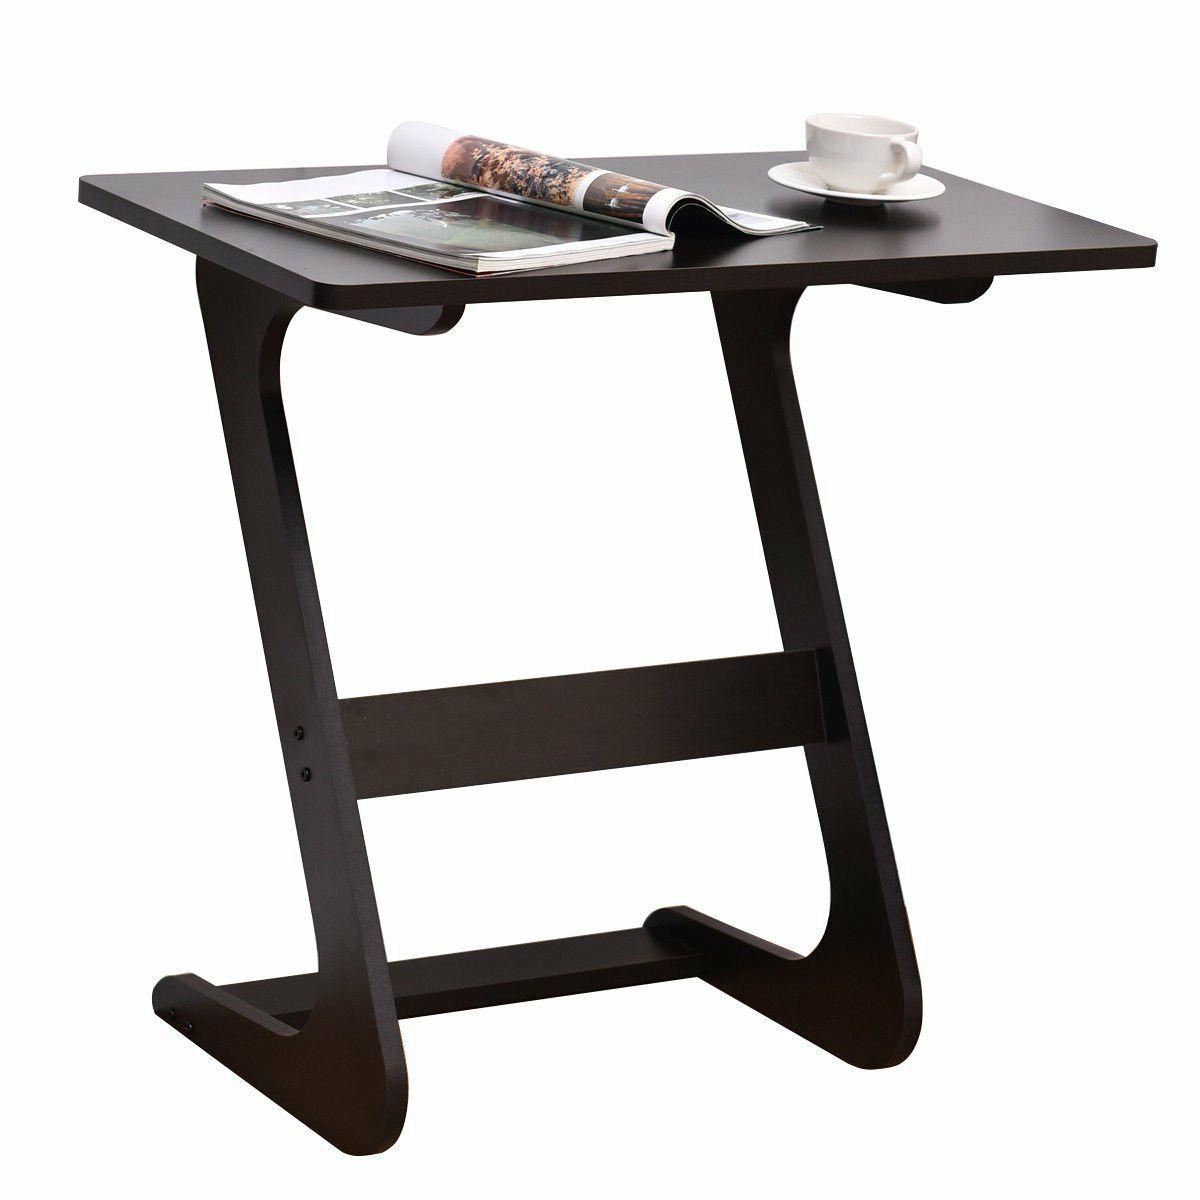 TANGKULA Portable Table Snack End Coffee Wood